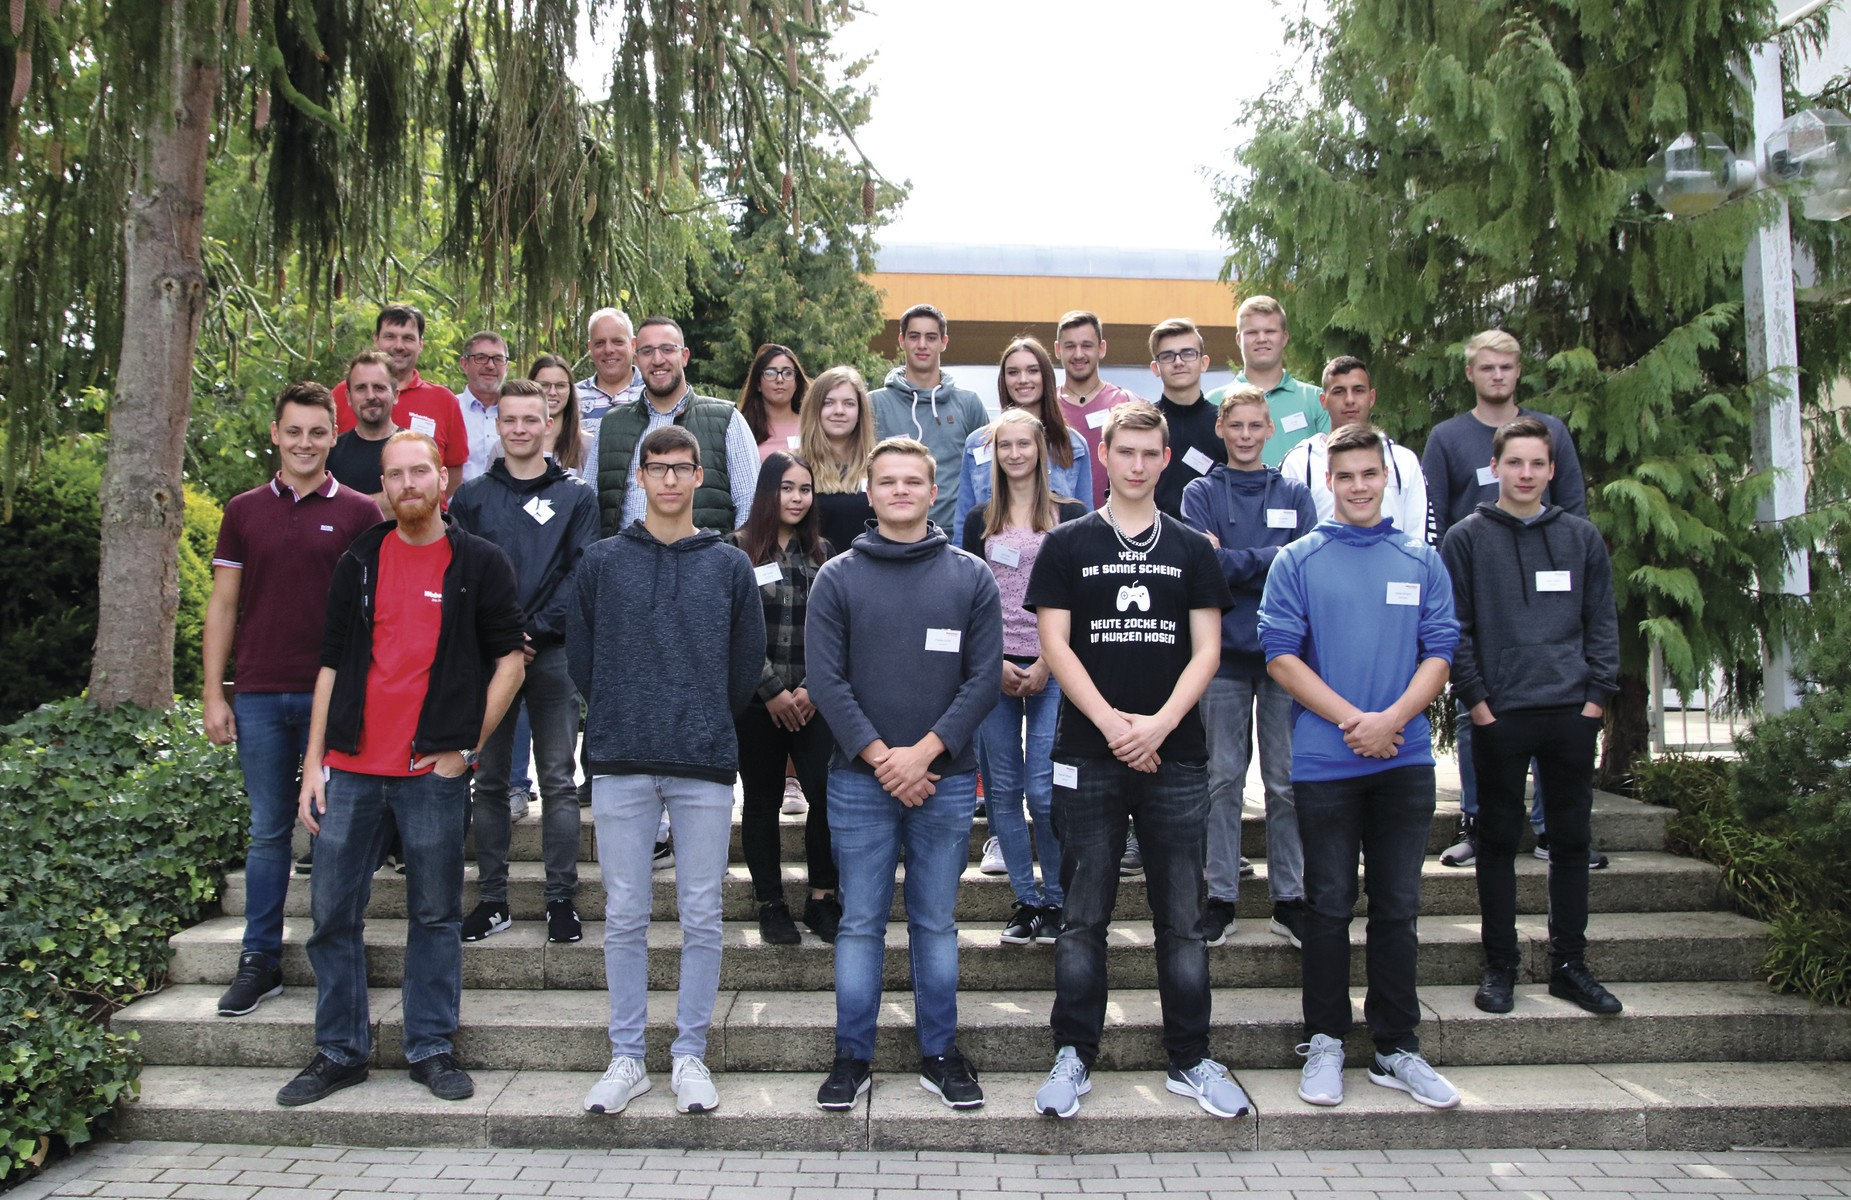 20 neue Auszubildende bei WeberHaus